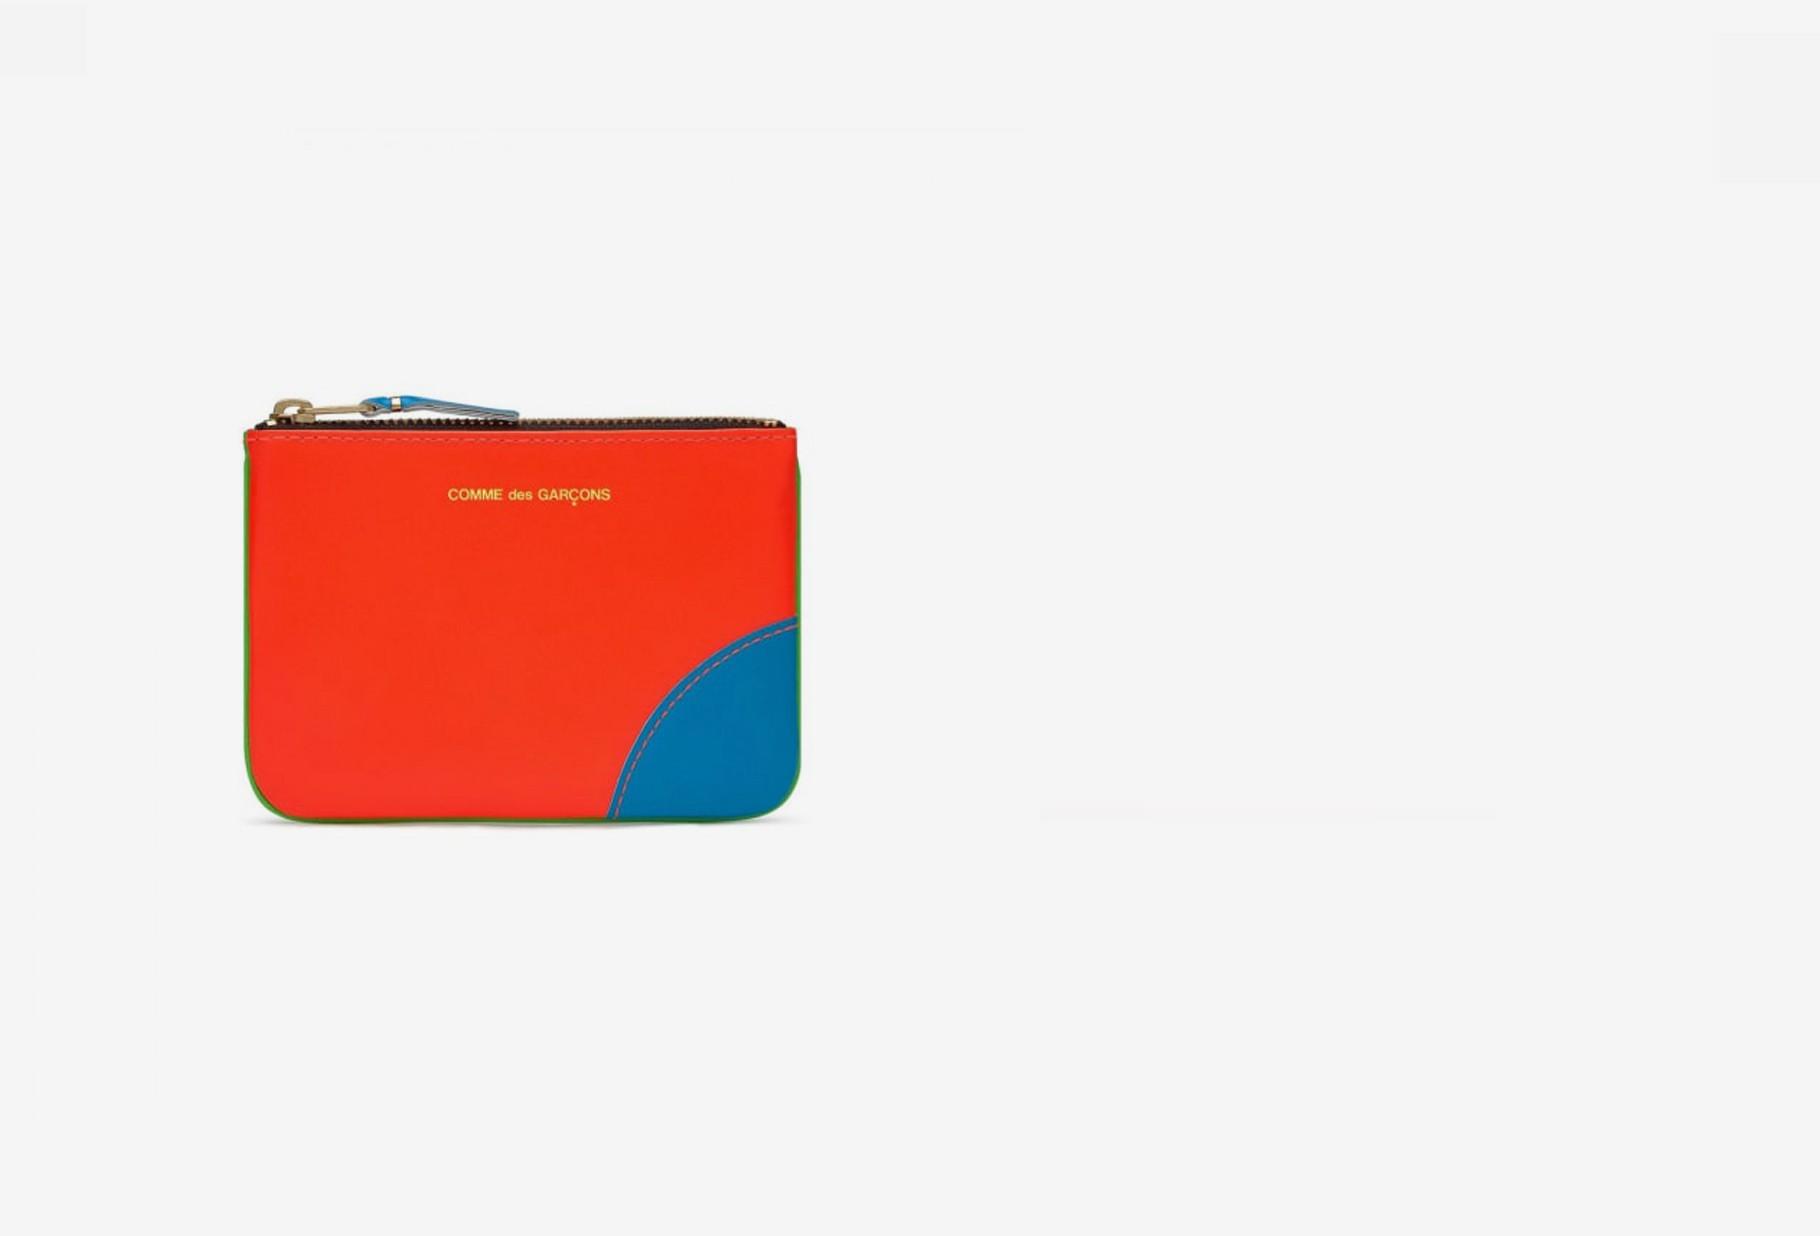 COMME DES GARÇONS WALLETS / Cdg super fluo sa8100sf Orange blue